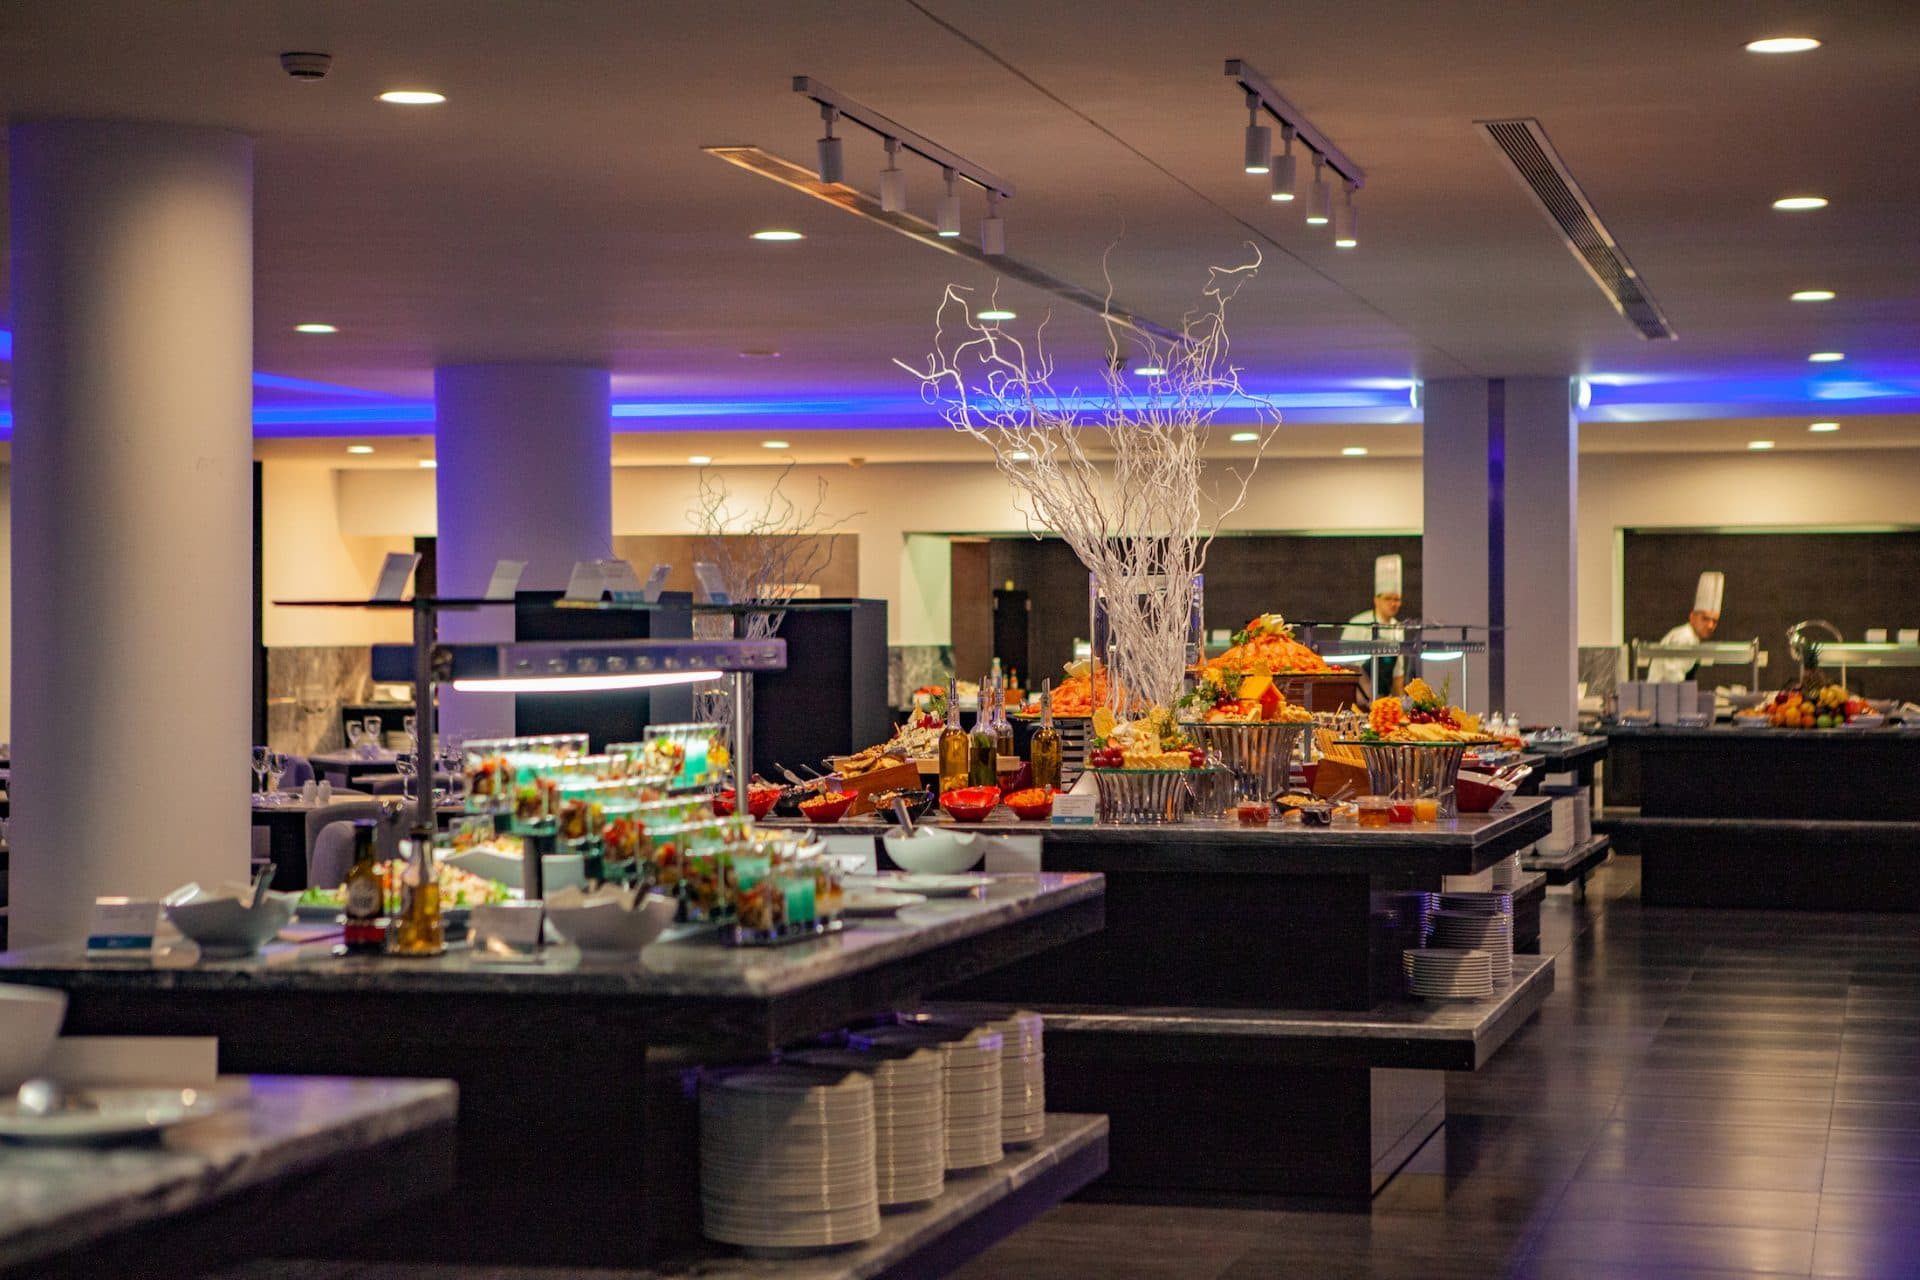 ocean-buffet-galery-VidaMar-Hotels-Resorts-Madeira